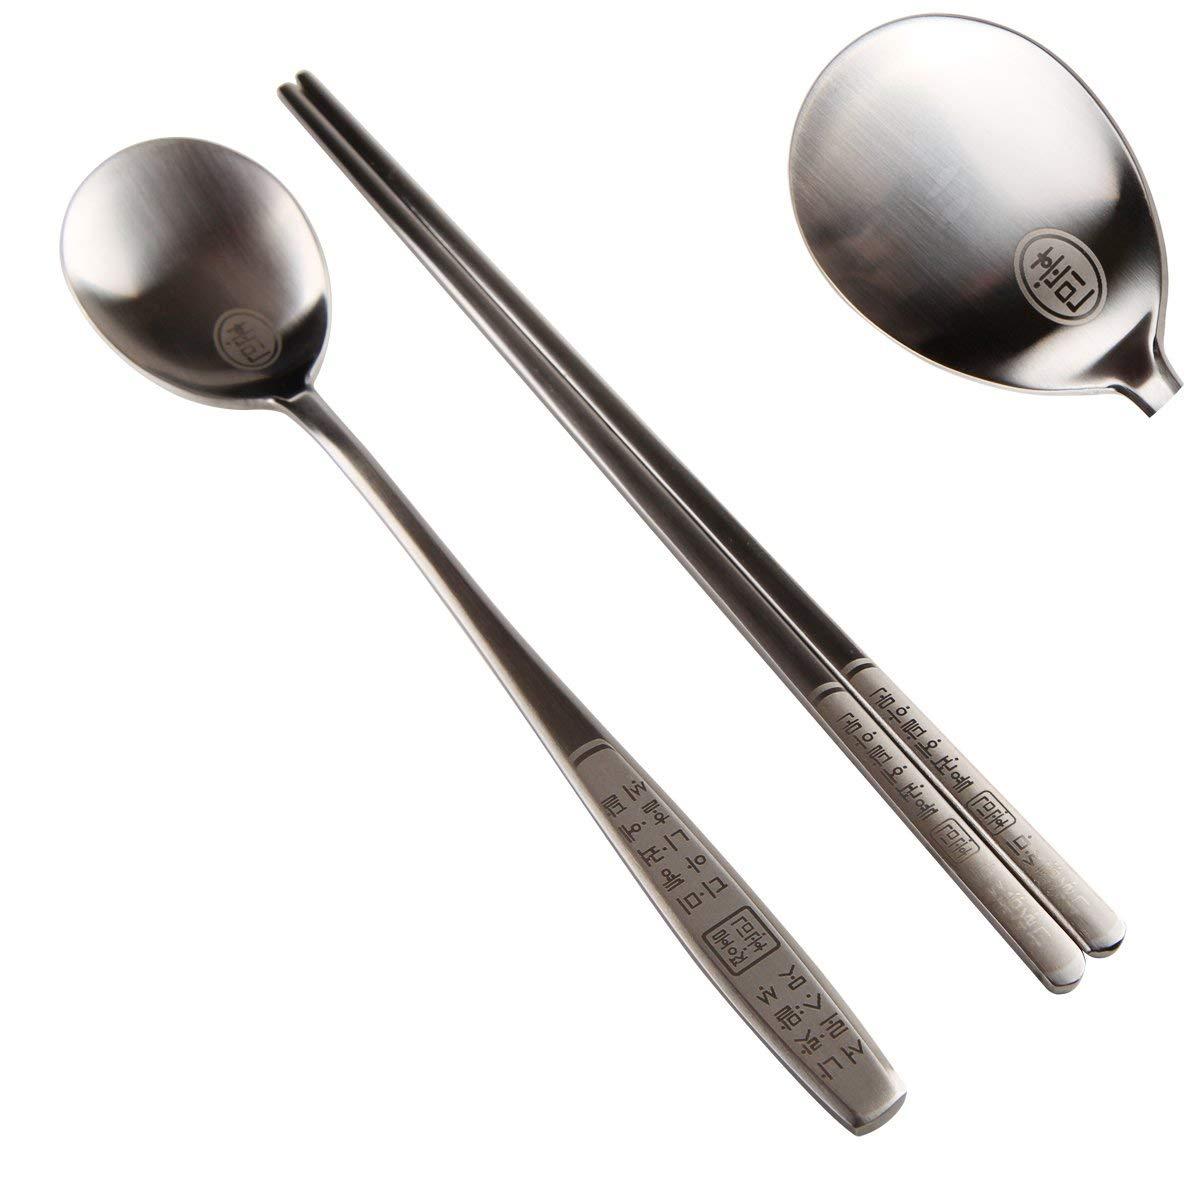 9a6a9c9fd Get Quotations · 2 Sets of Stainless Steel Hangul Korean Alphabet Spoon  Chopsticks 18/10 Thick